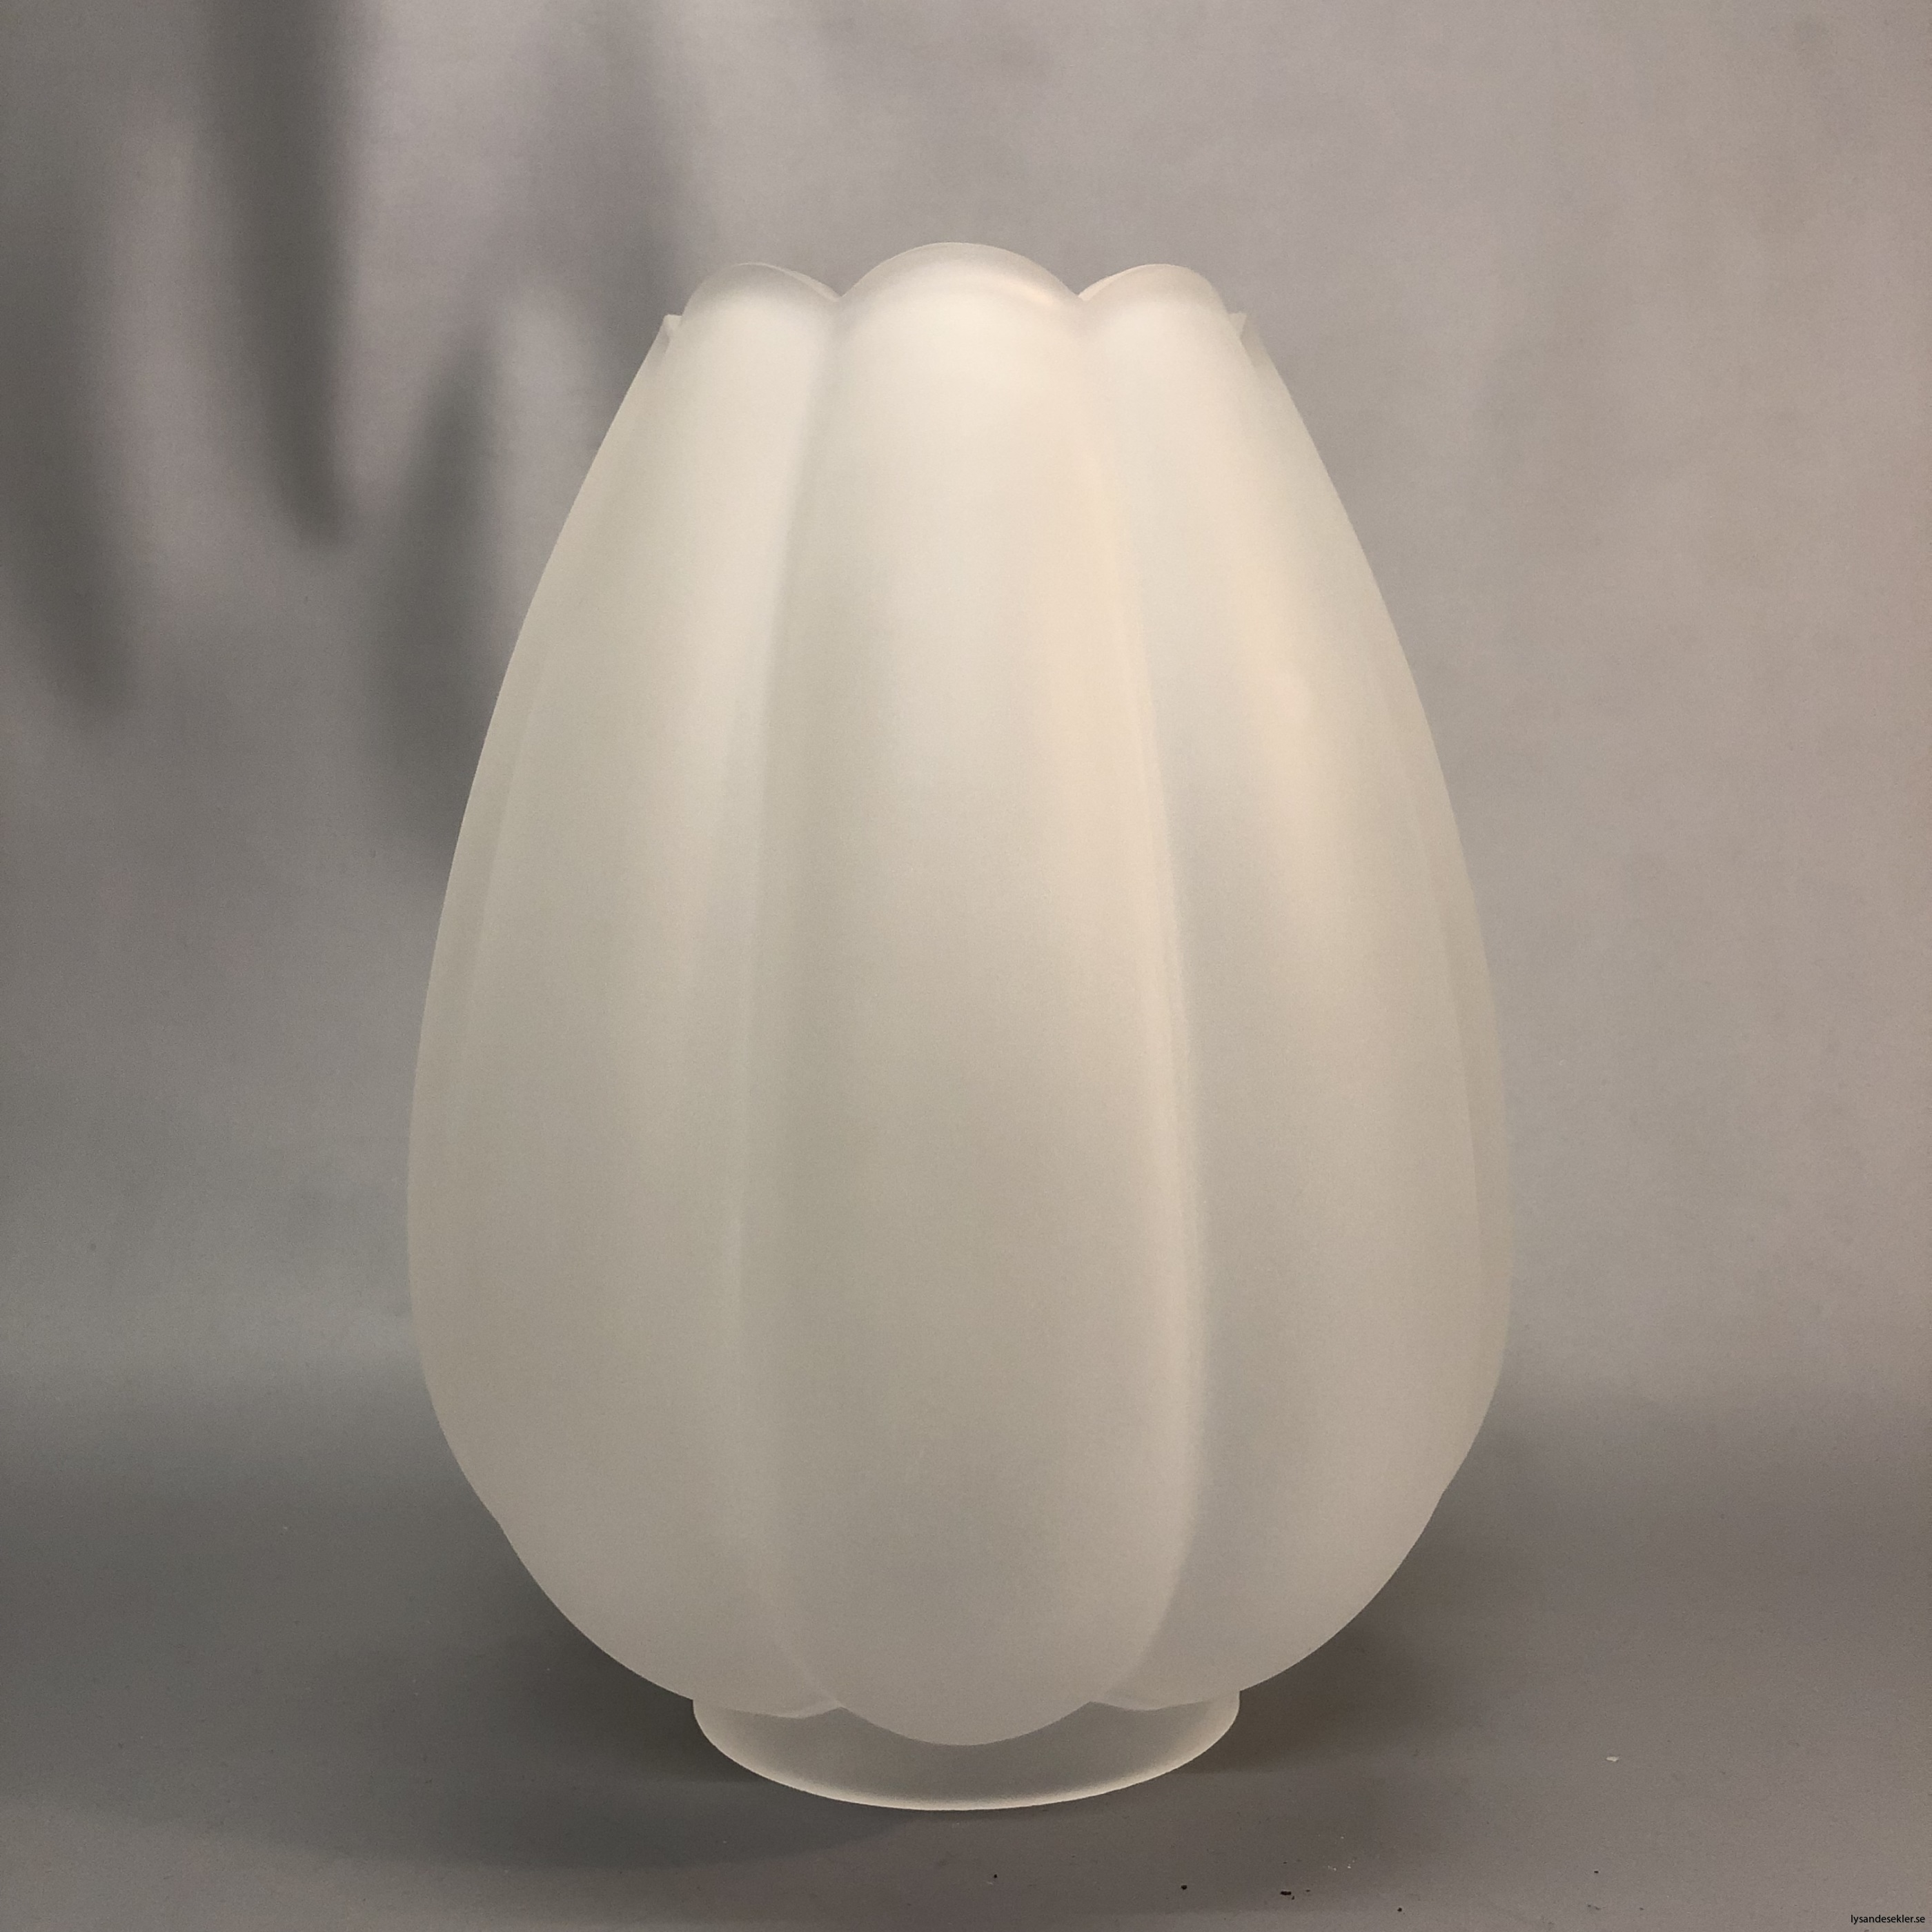 fotogenlampskupa kupa till fotogenlampa tulipan tulpan tulpankupor kupor19